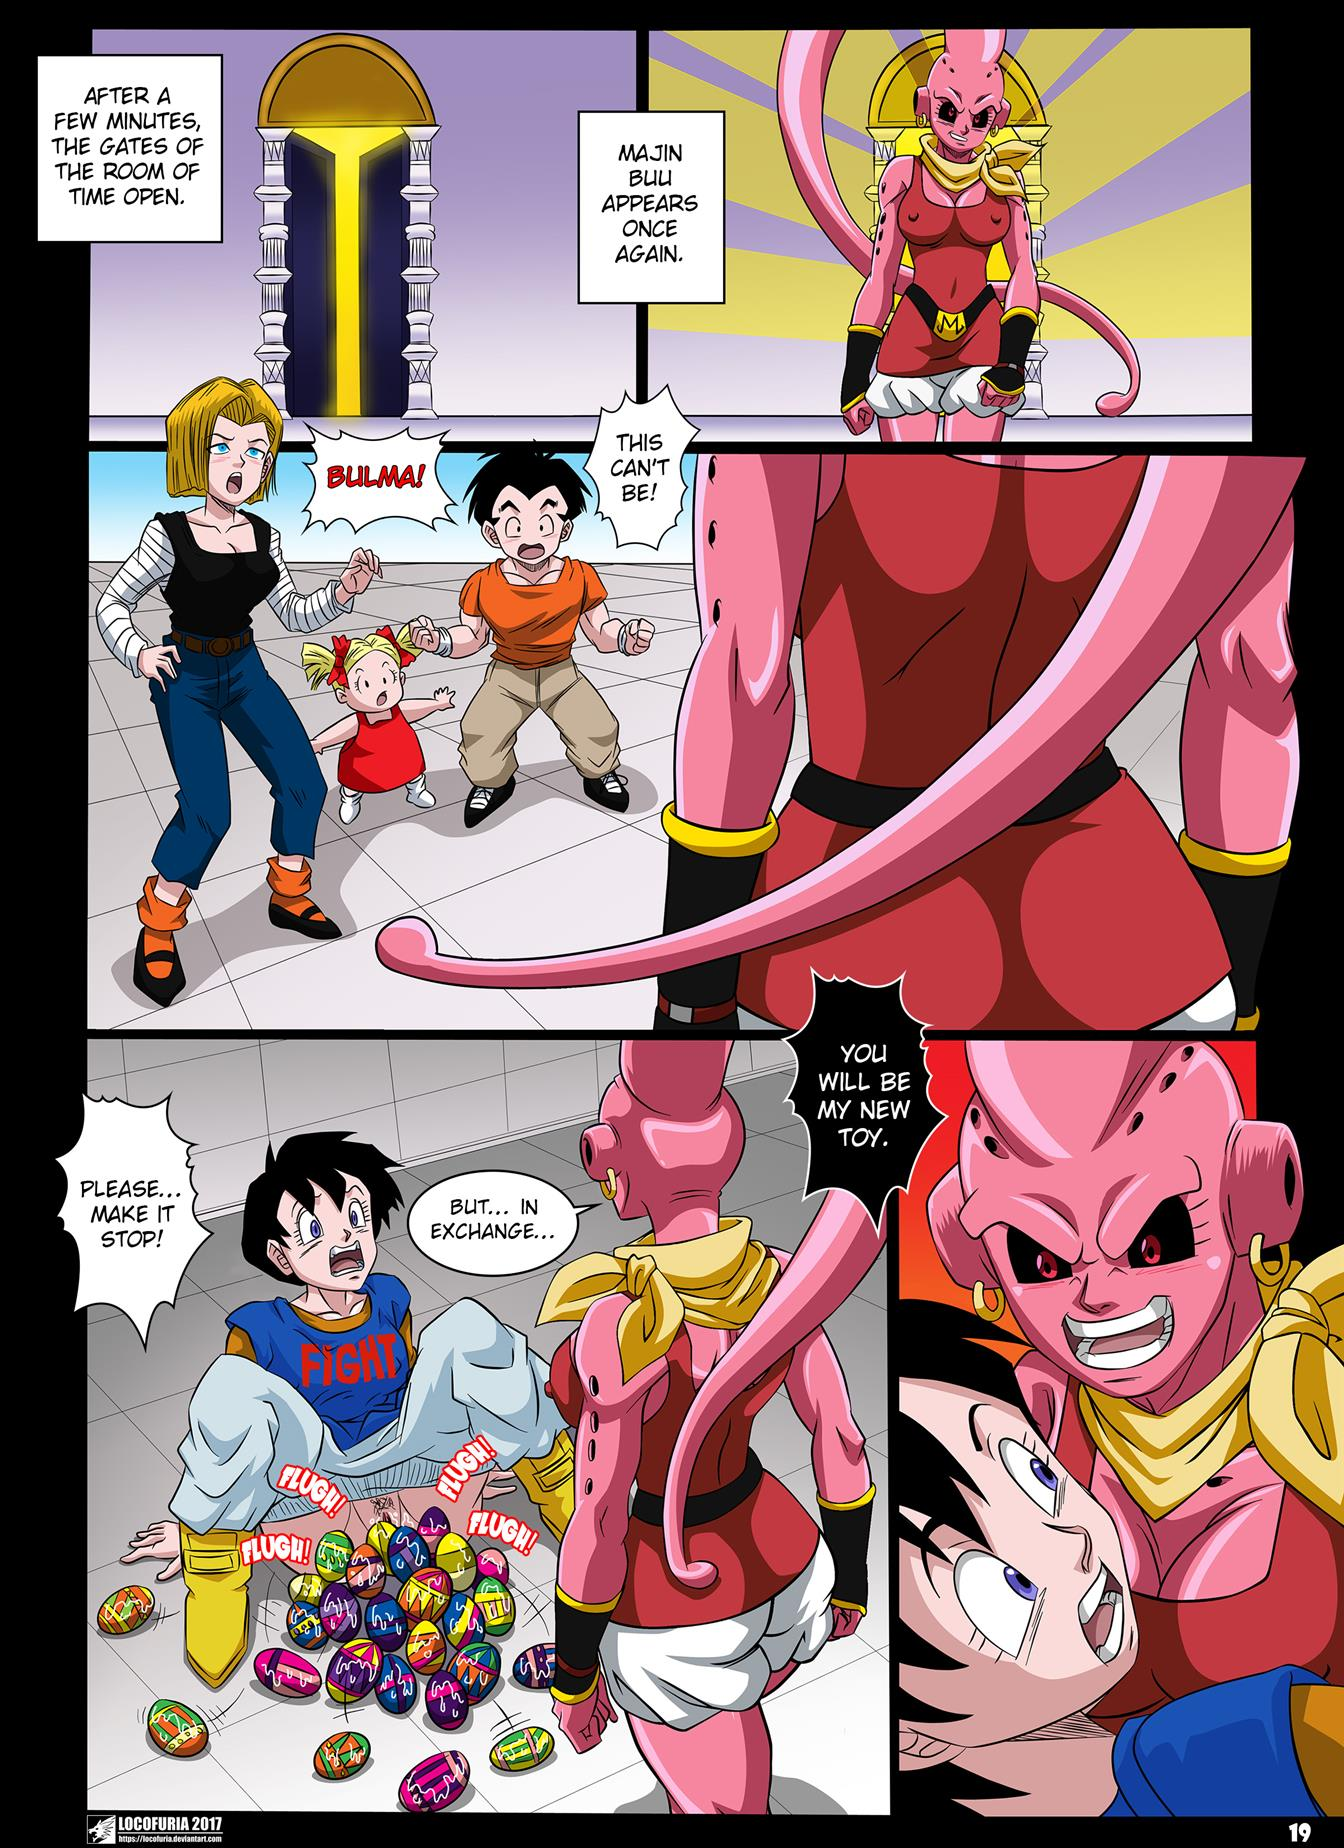 Buu's Bodies 2 (Dragon Ball Z) - Foto 21